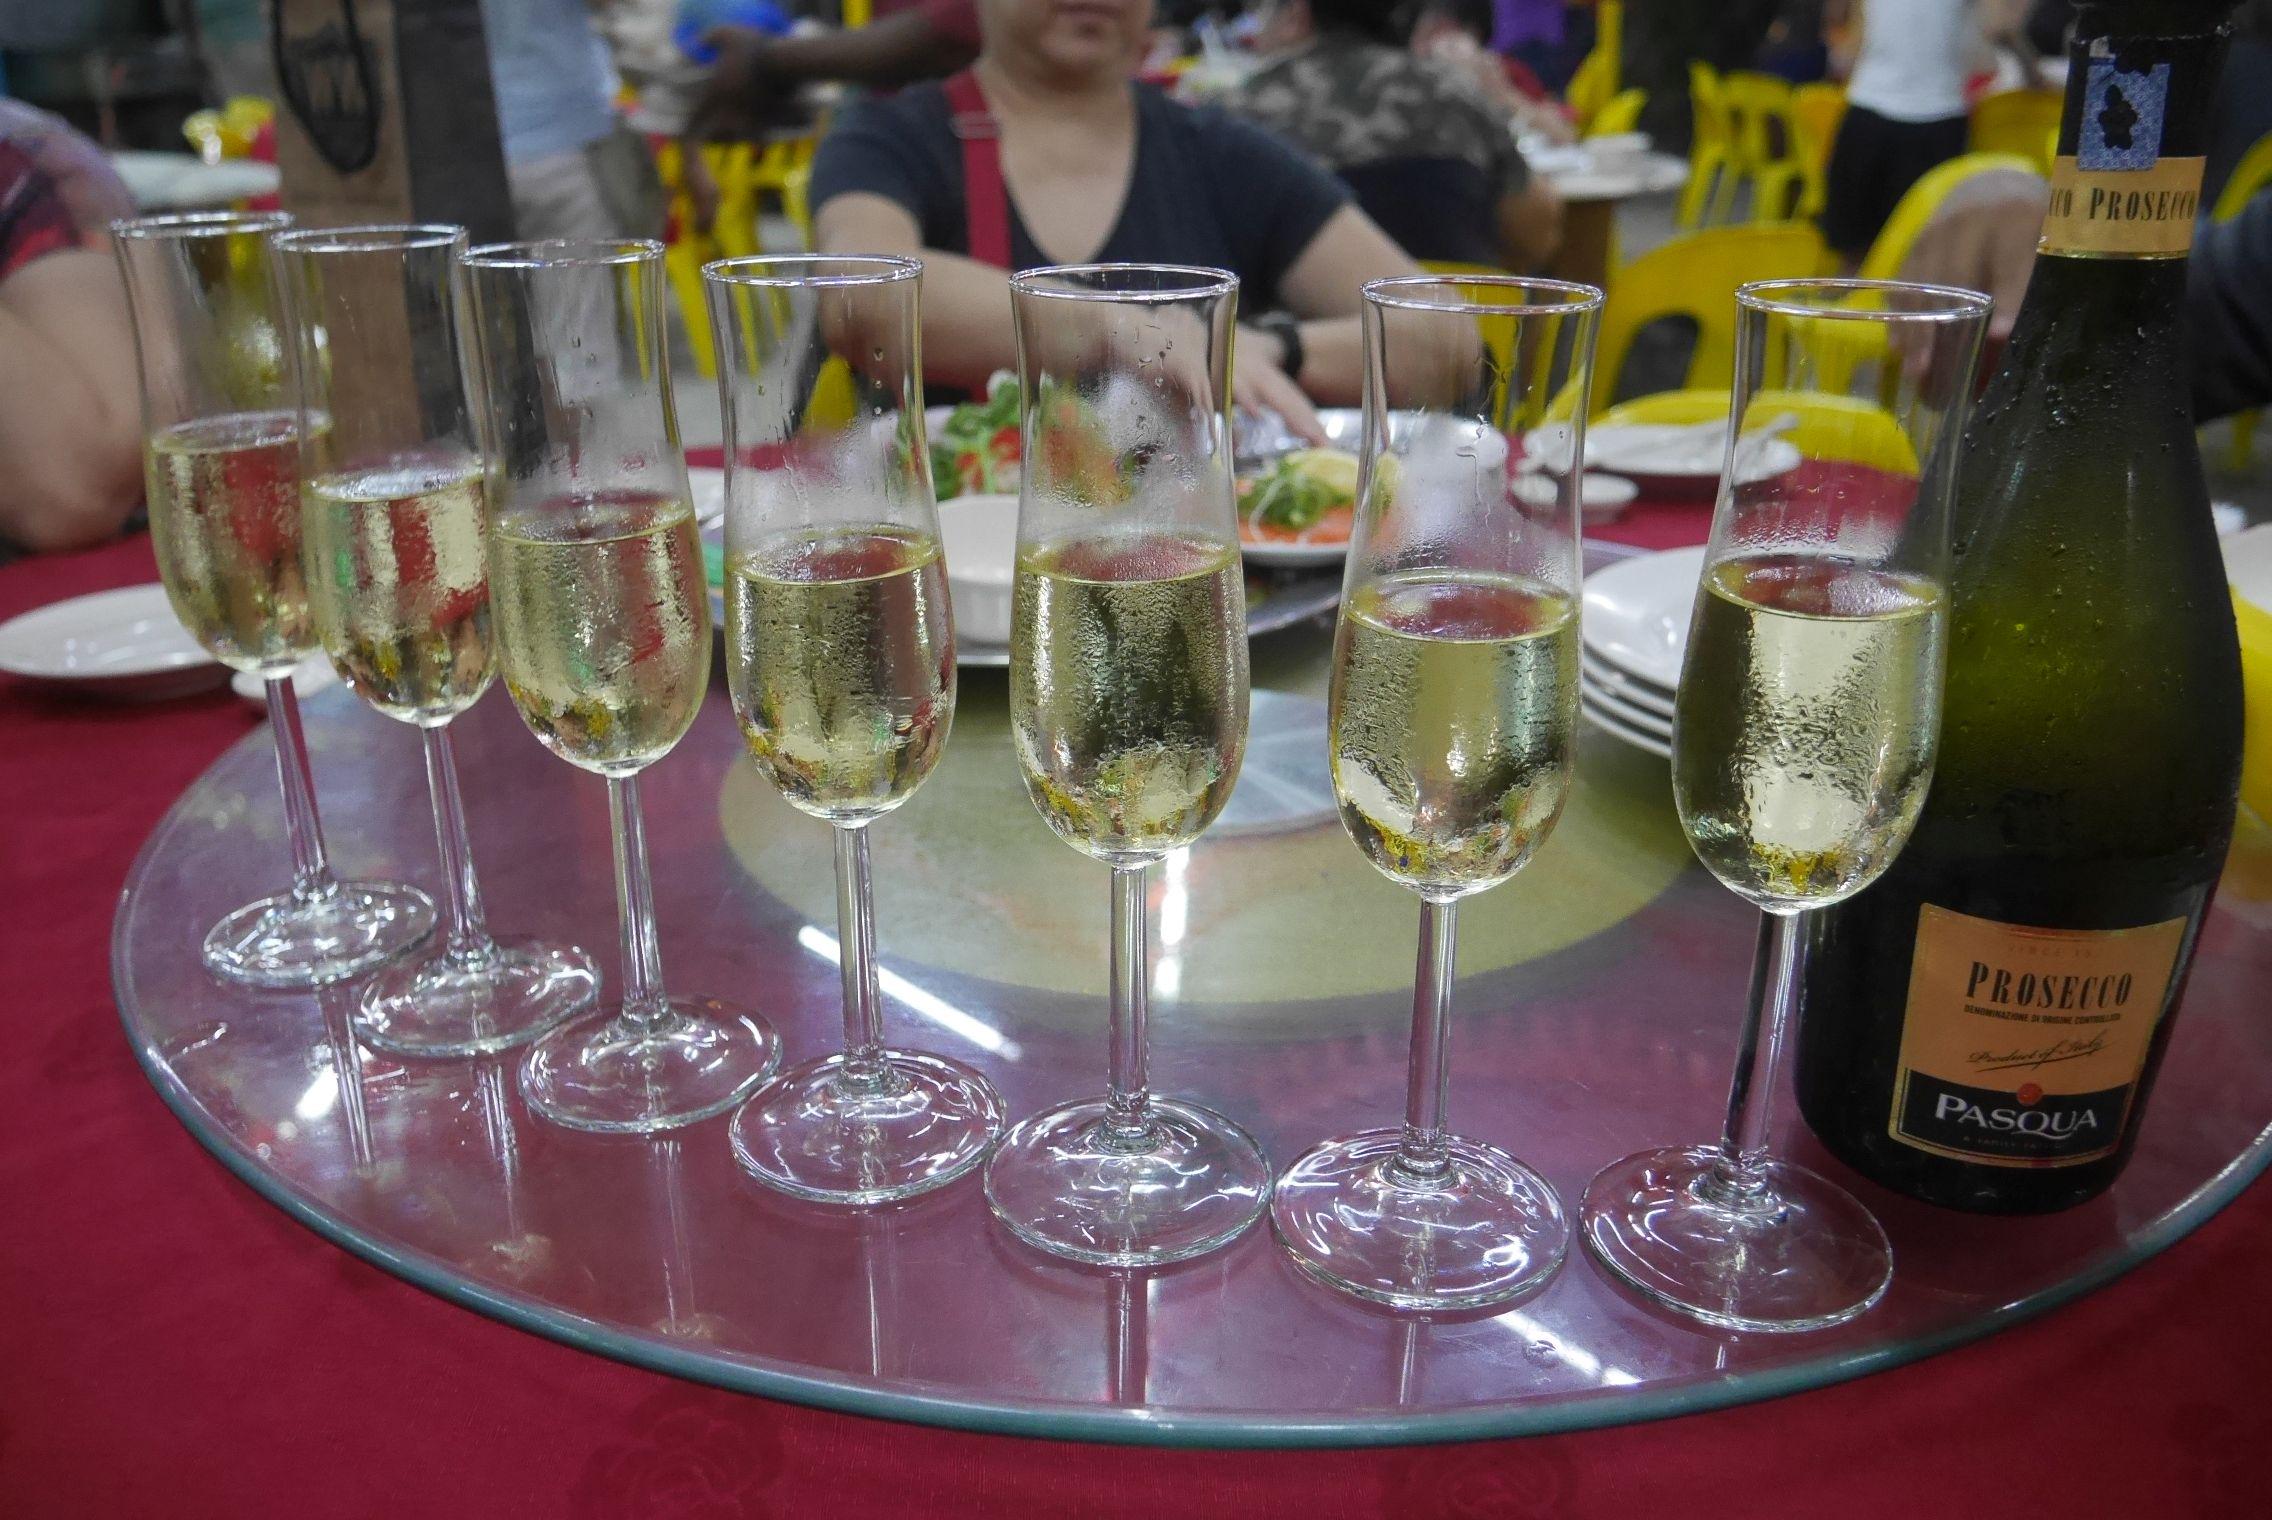 BYO Prosecco and champagne glasses